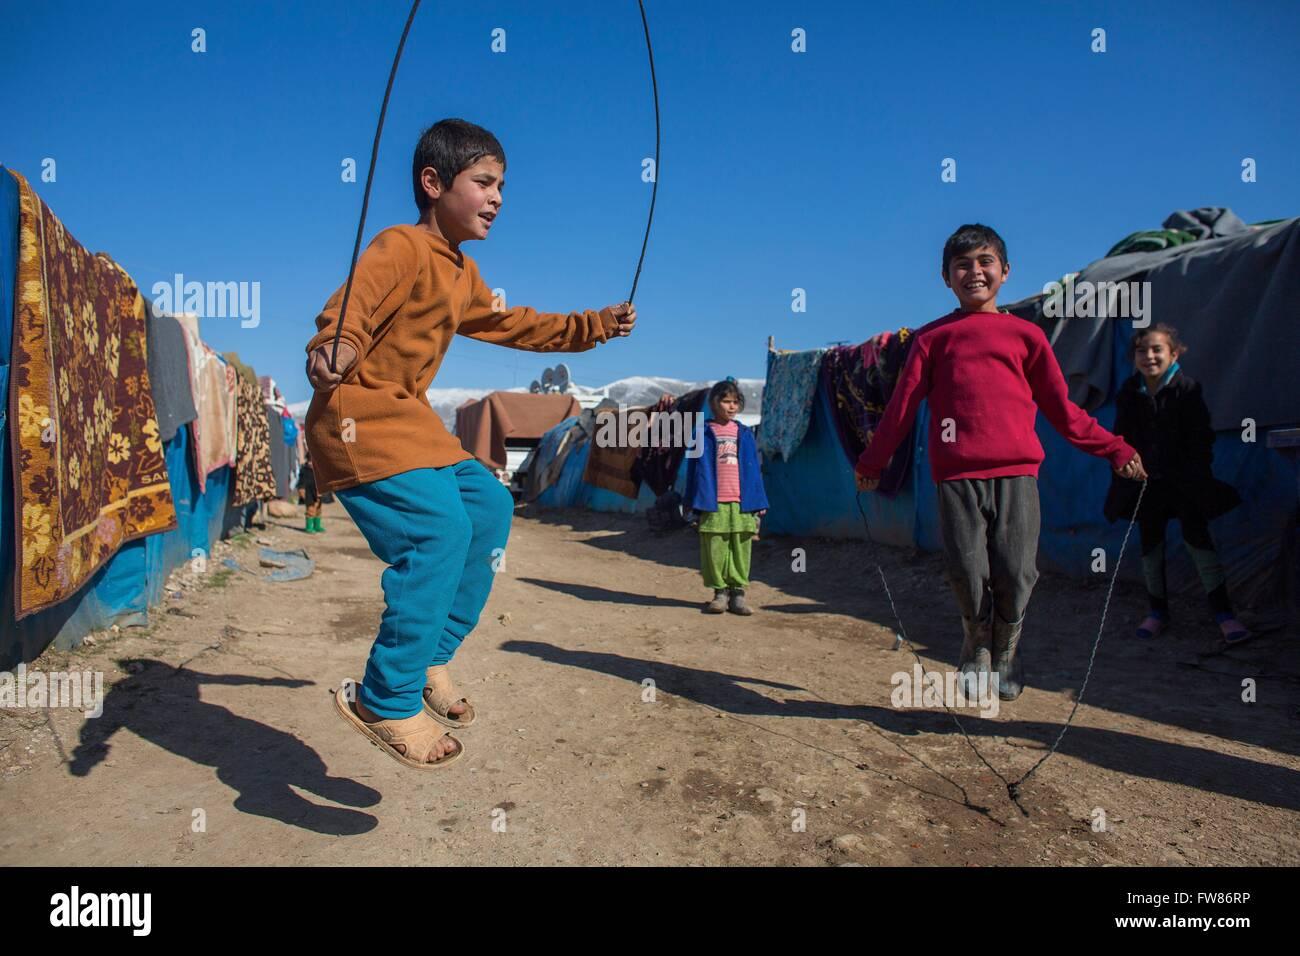 Kinder in einem Flüchtlingslager im Nordirak Seilspringen Stockbild